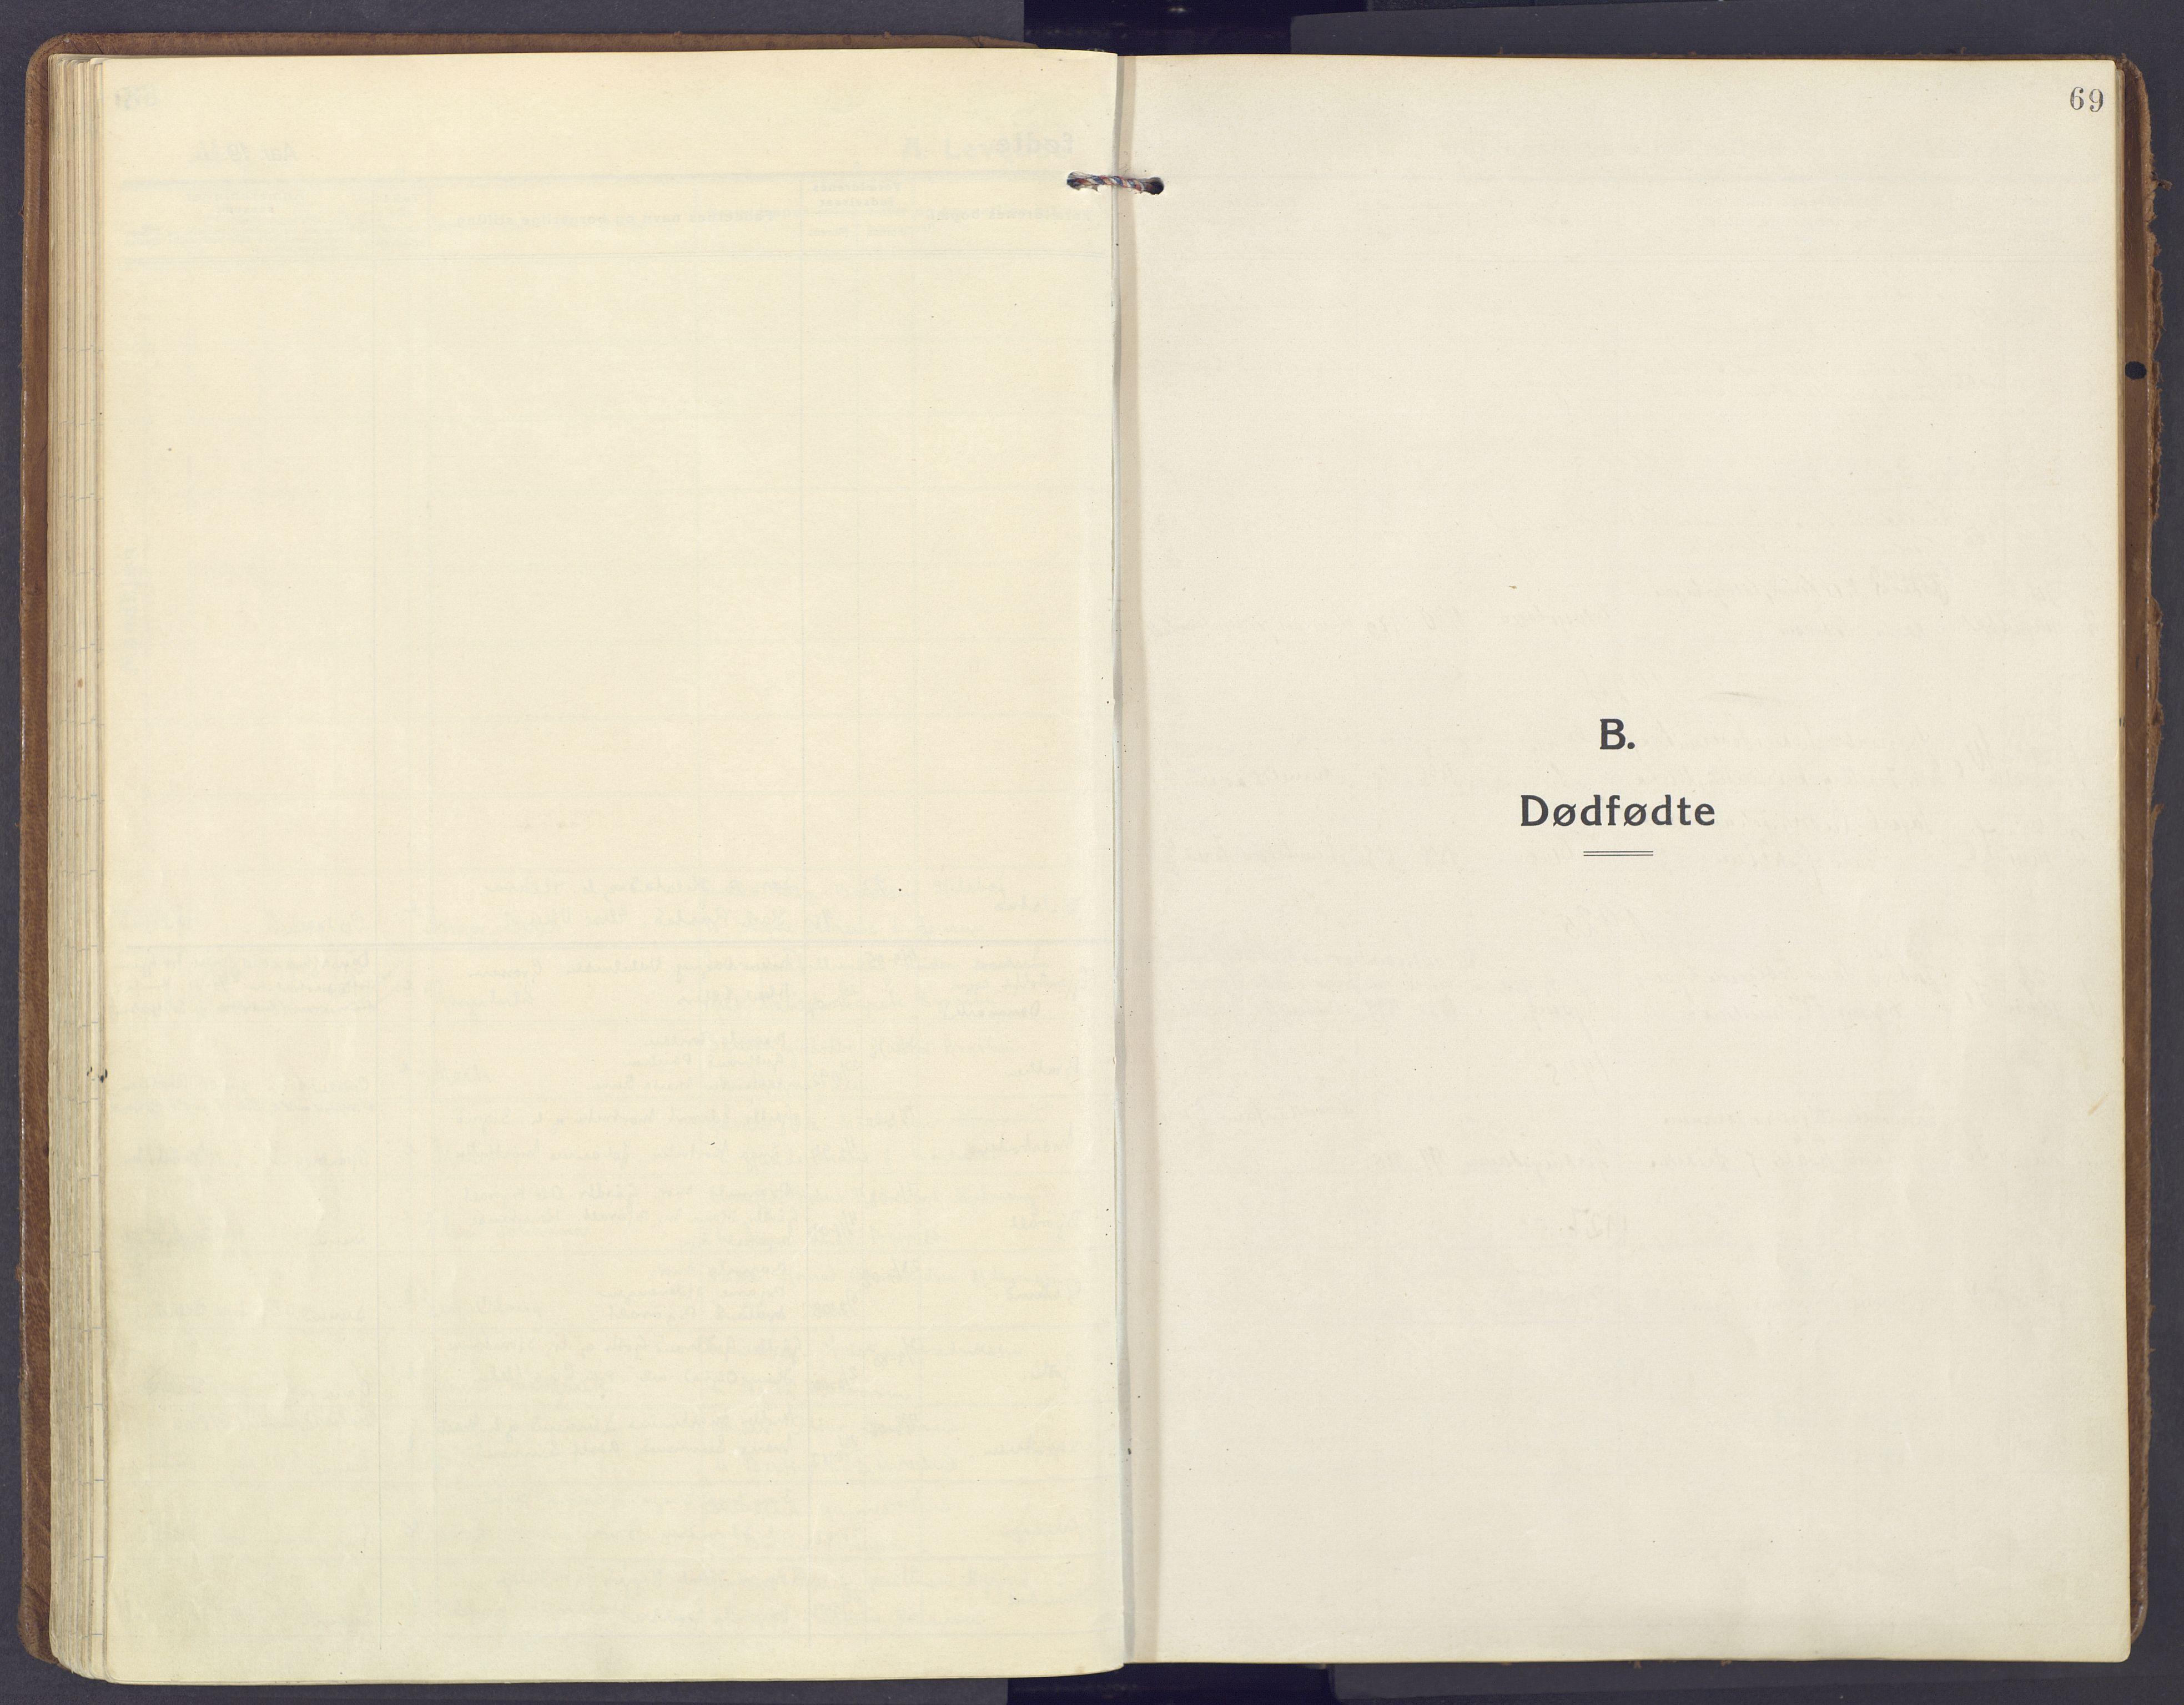 SAH, Lunner prestekontor, H/Ha/Haa/L0002: Ministerialbok nr. 2, 1922-1931, s. 69